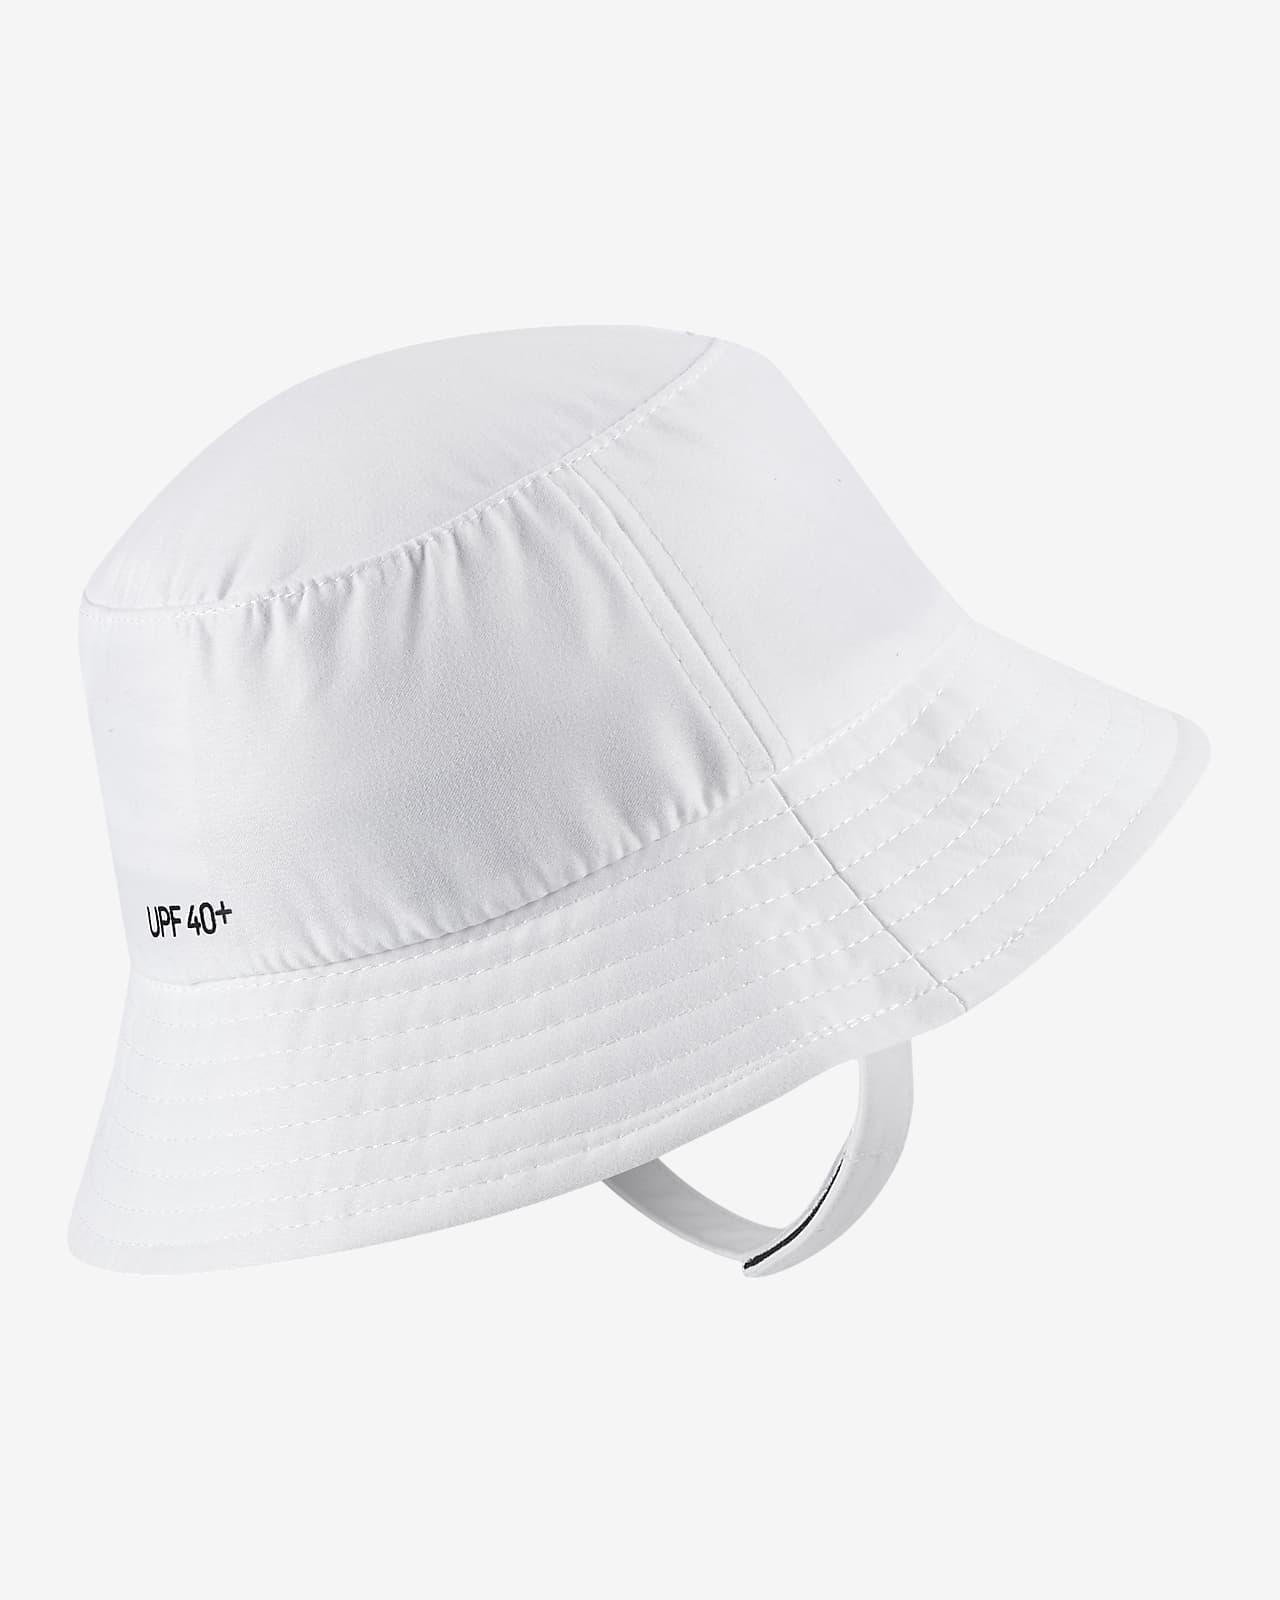 Nike Baby (12-24M) Bucket Hat. Nike.com